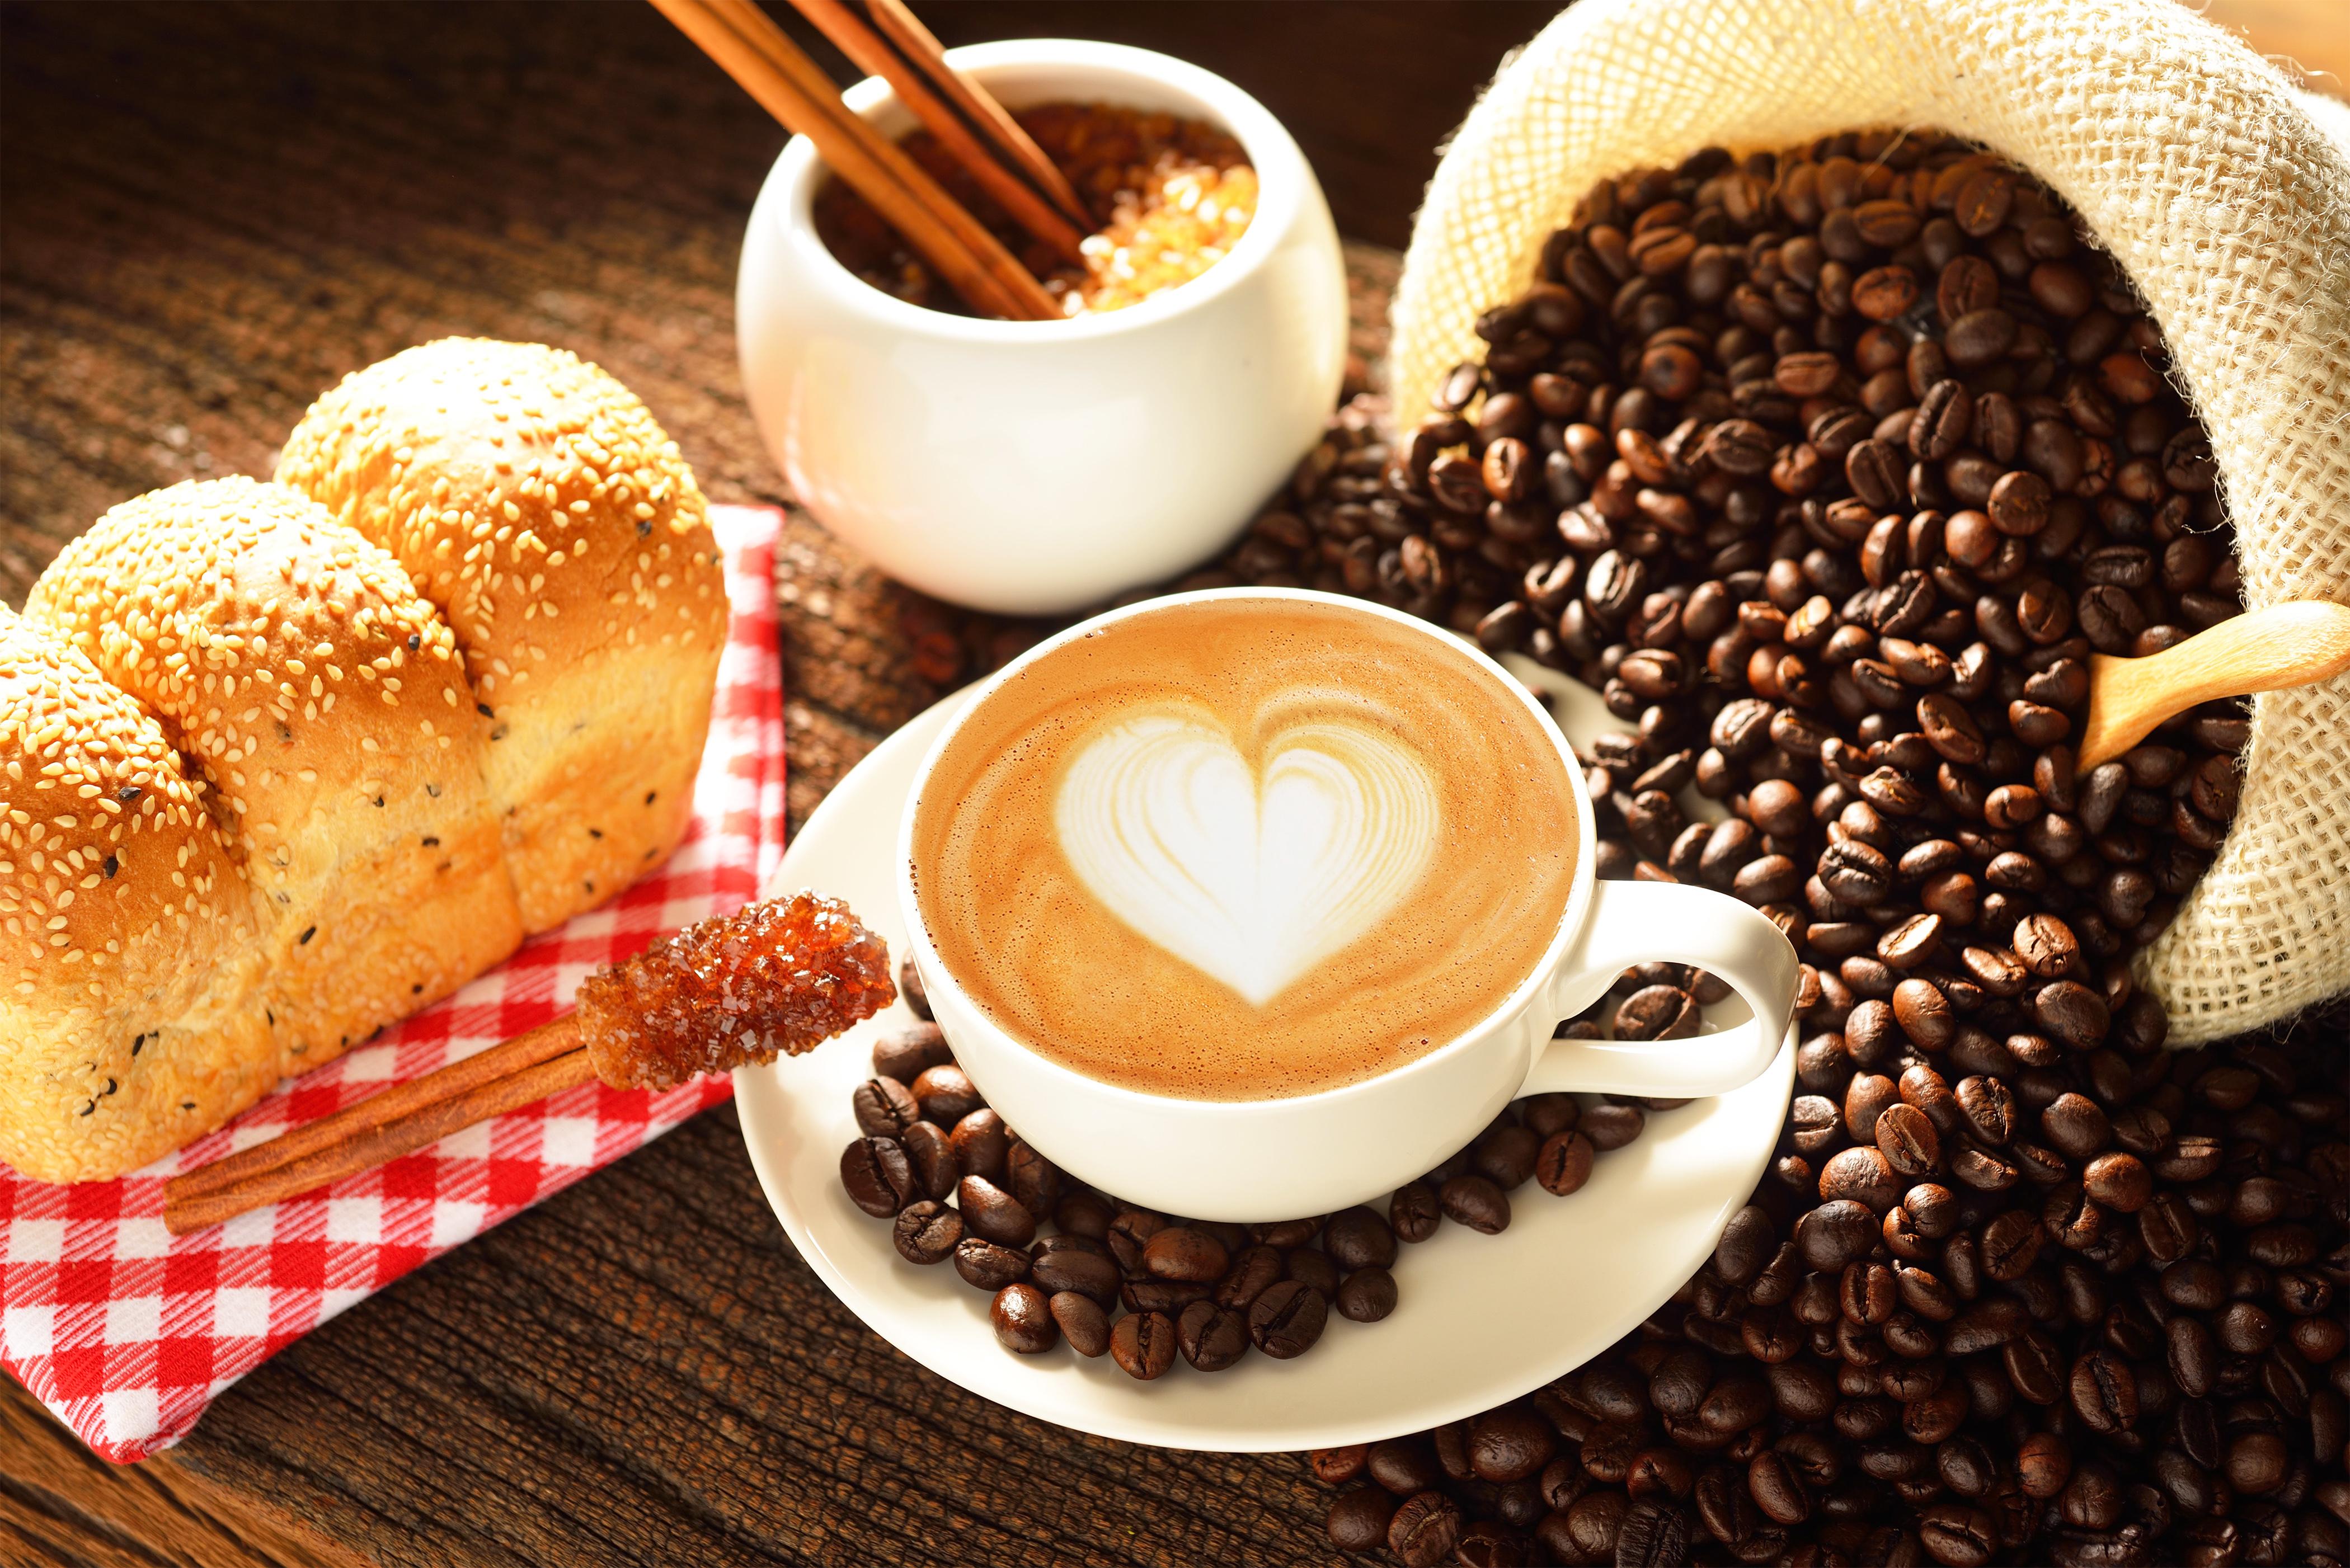 tactical plan for custom coffee and chocolate company